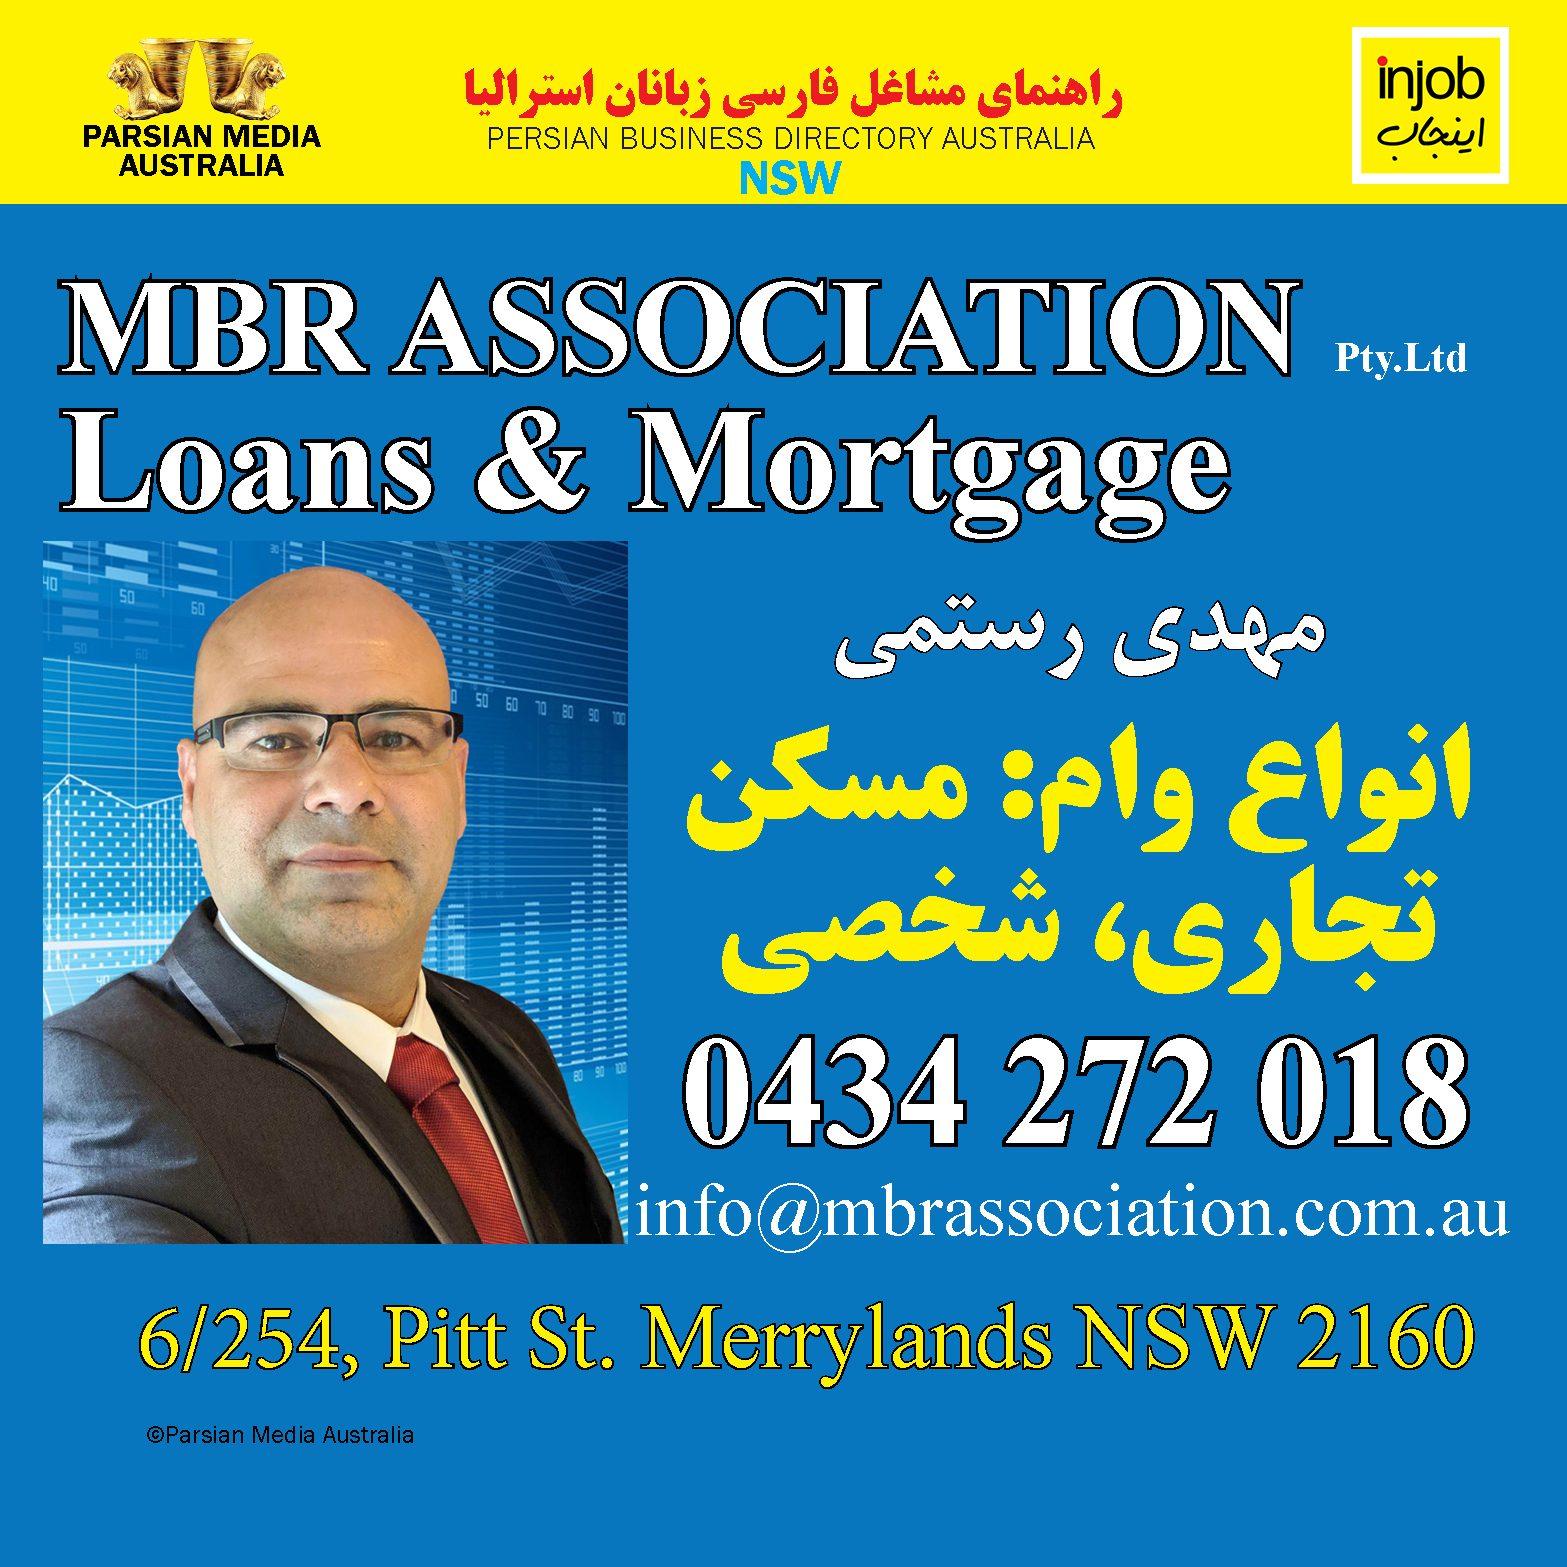 MBR-Finance-Injob-2021-2022-online.jpg